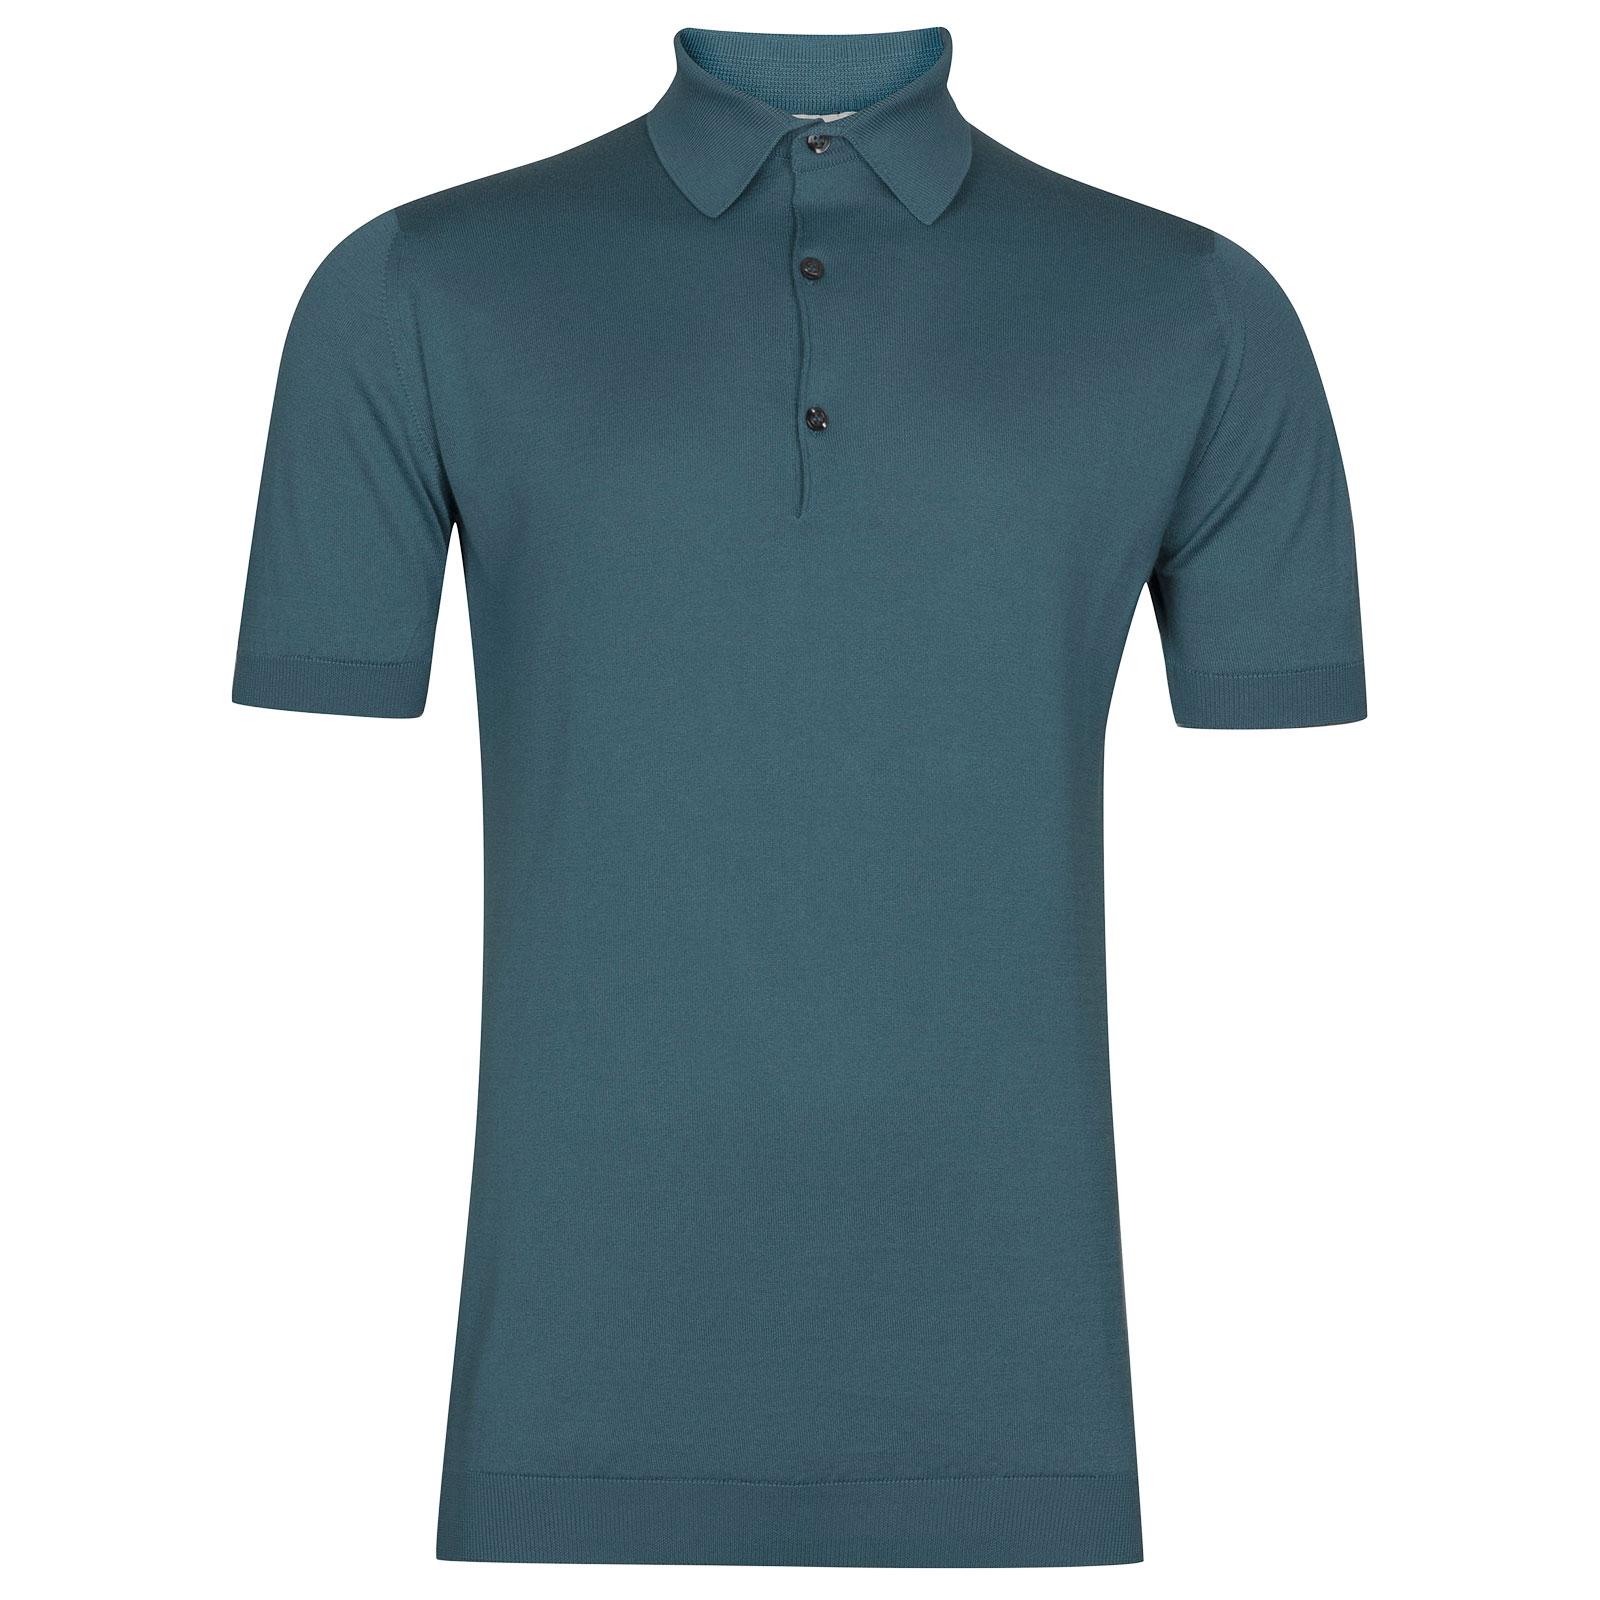 John Smedley Adrian in Dewdrop Blue Shirt-MED